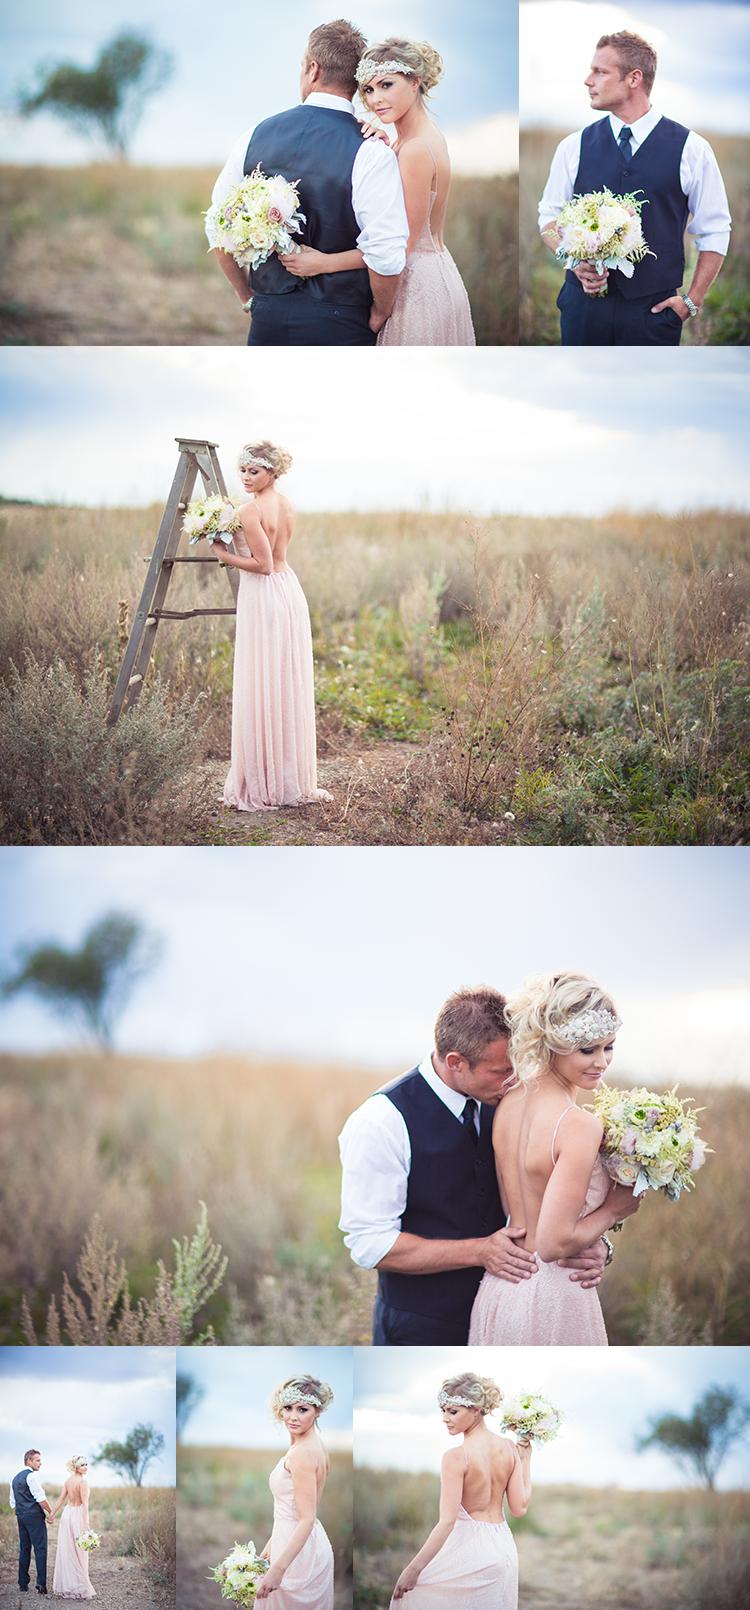 Just For You Photography, Edmonton Wedding Photography